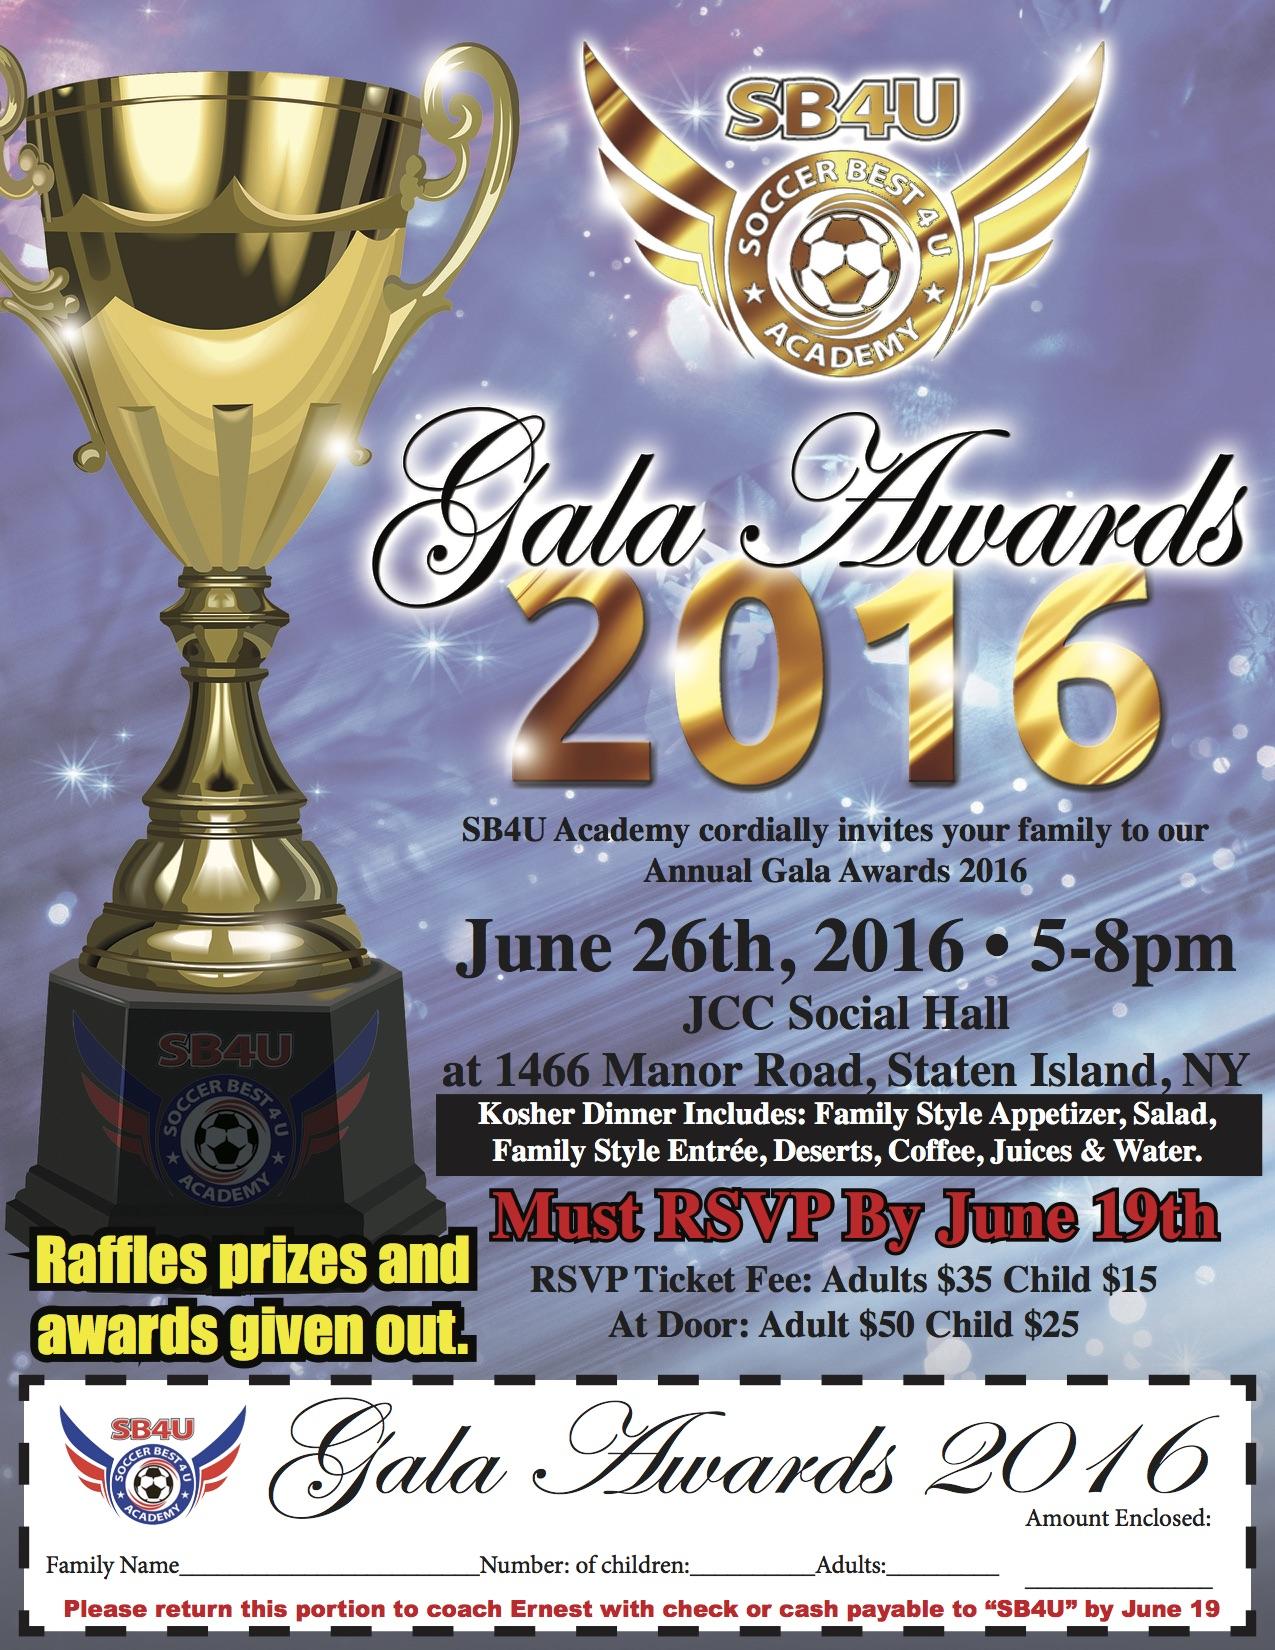 Gala Awards 2016